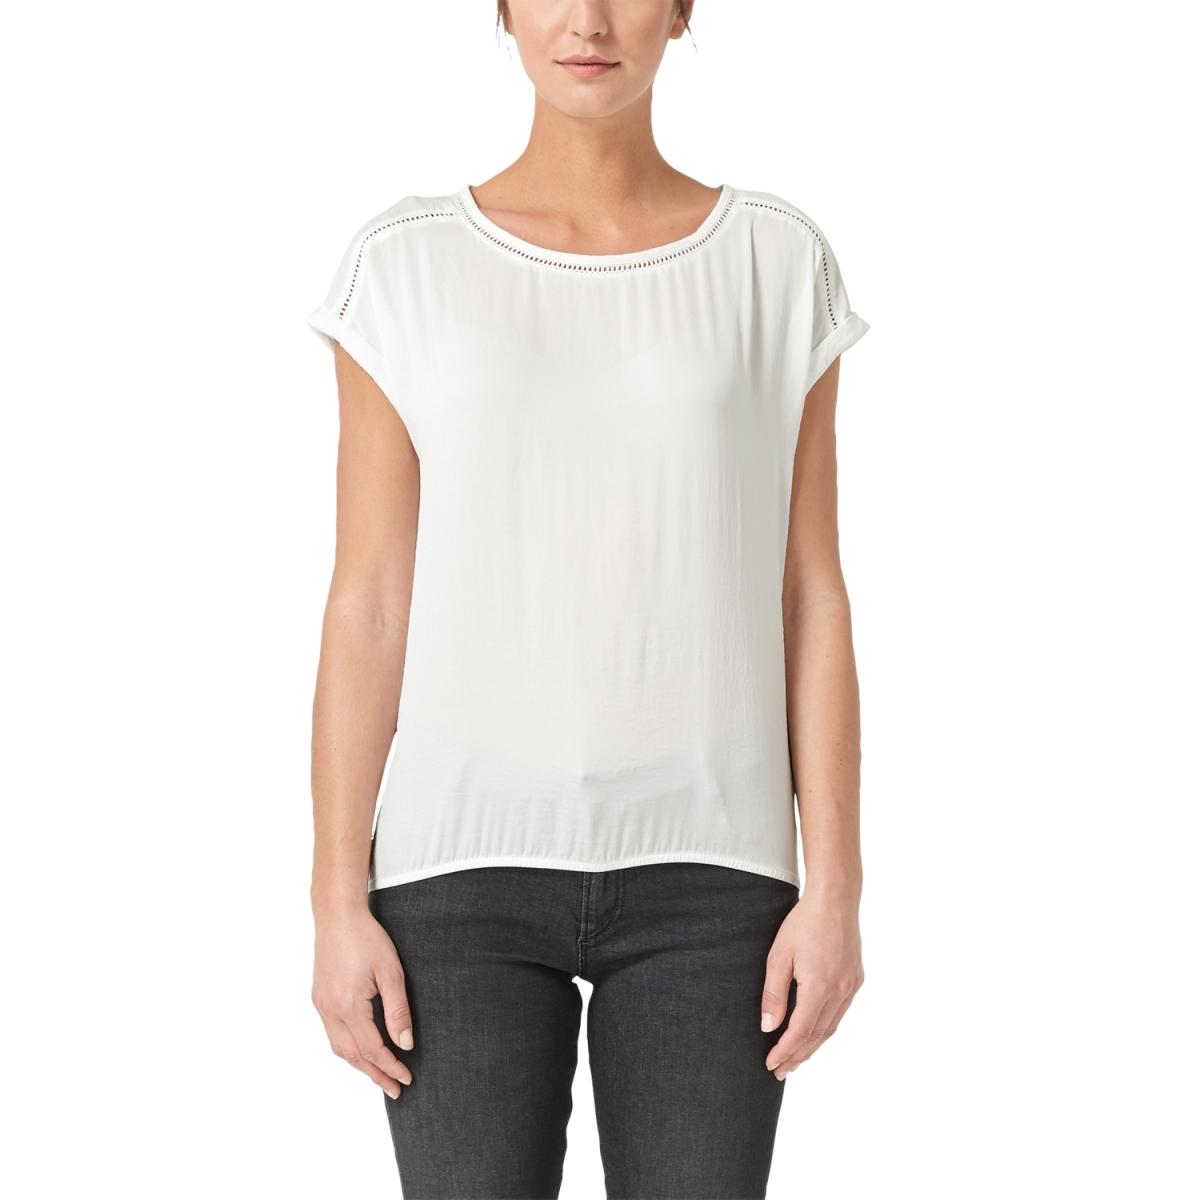 04899325075 s.oliver t-shirt 0210